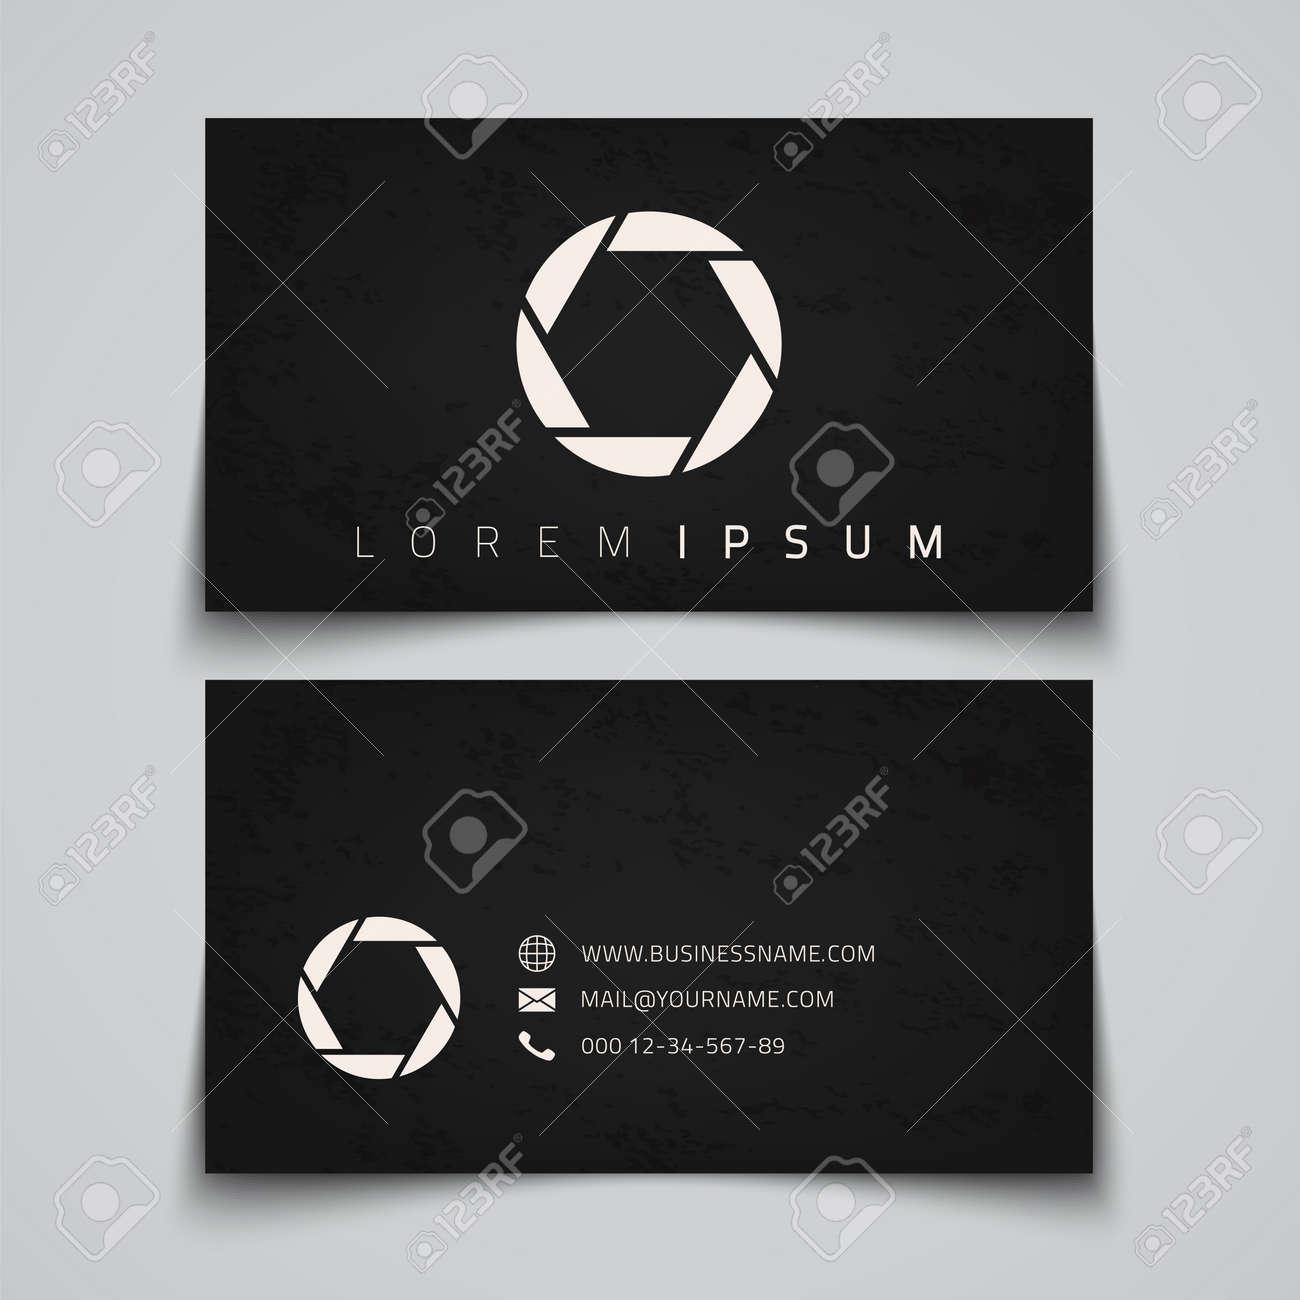 business card template camera shutter concept logo vector